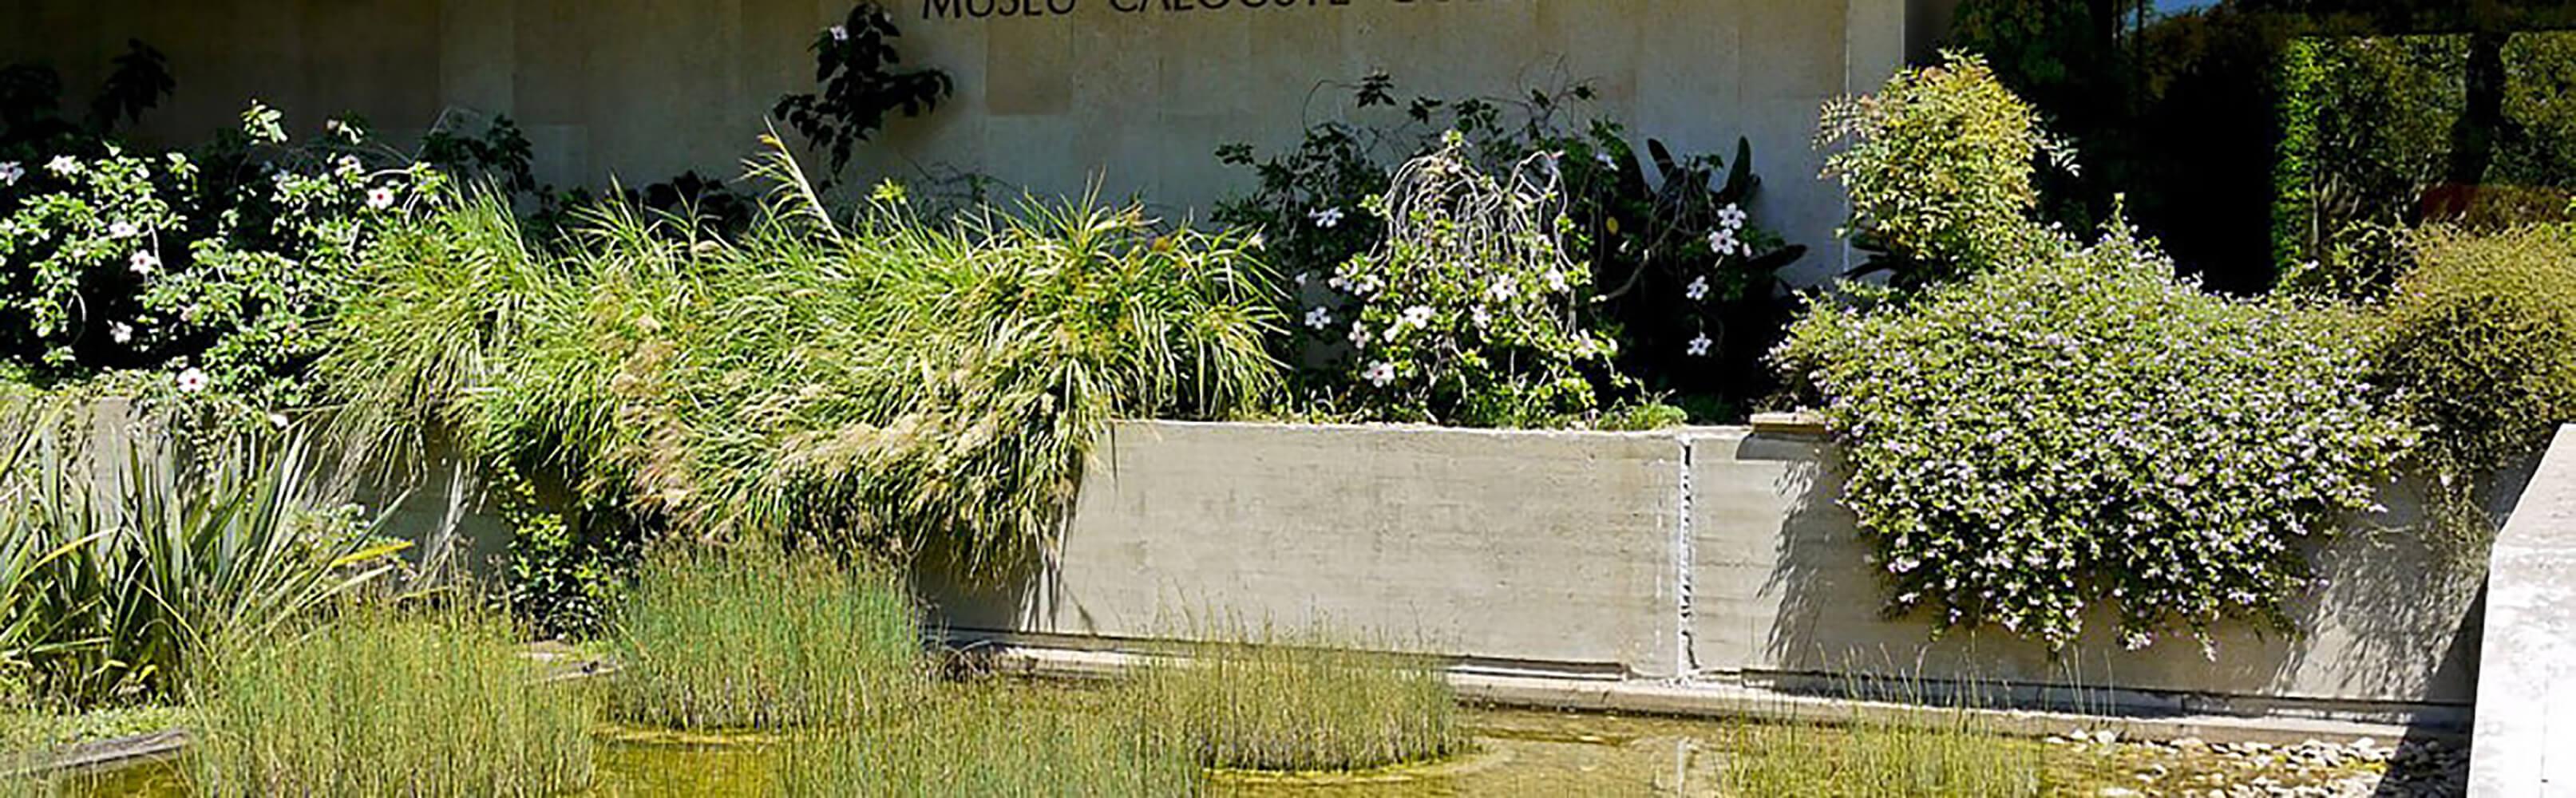 Museu Calouste Gulbenkian 1